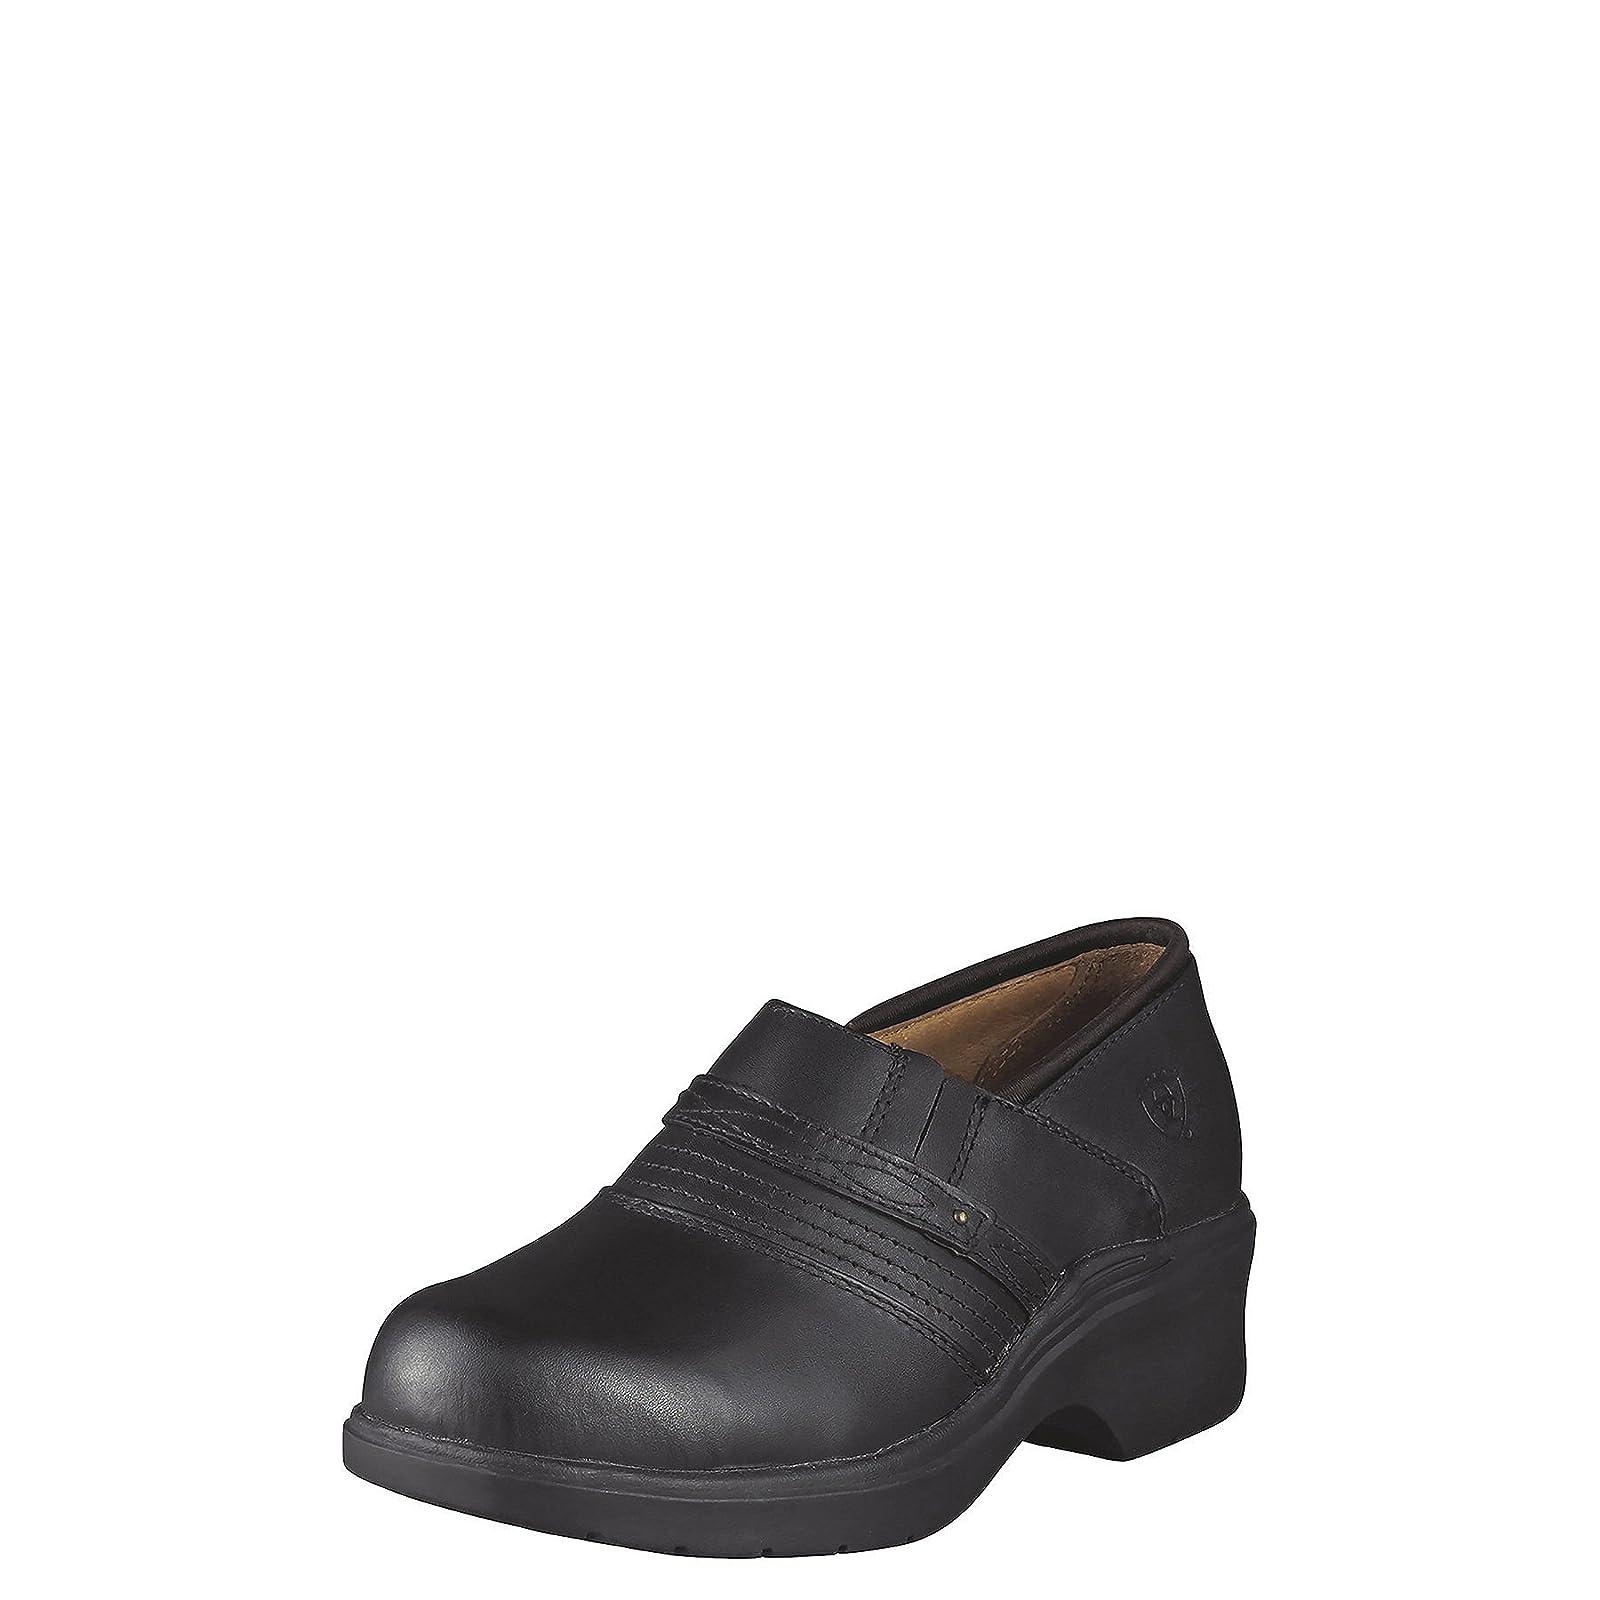 Ariat Women's Safety Toe Clog Black 8.5 C-Wide 10002368 - 1